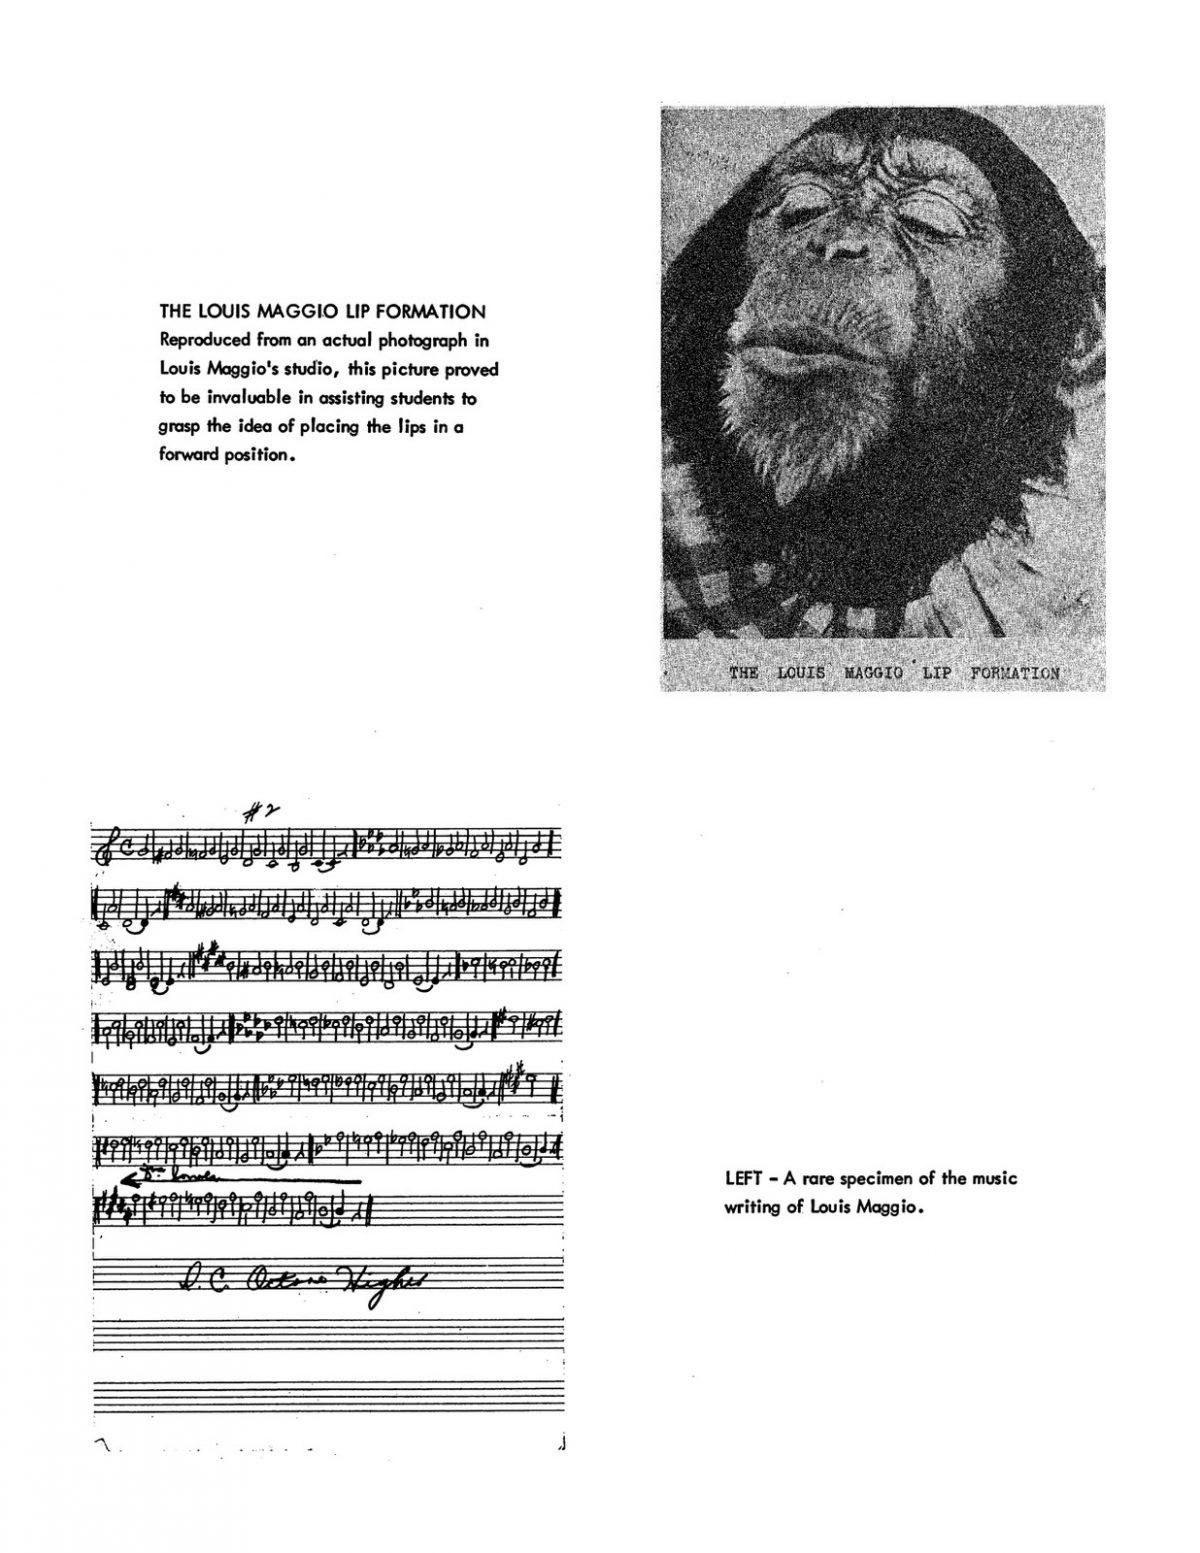 Macbeth, The Original Louis Maggio System for Brass-p019